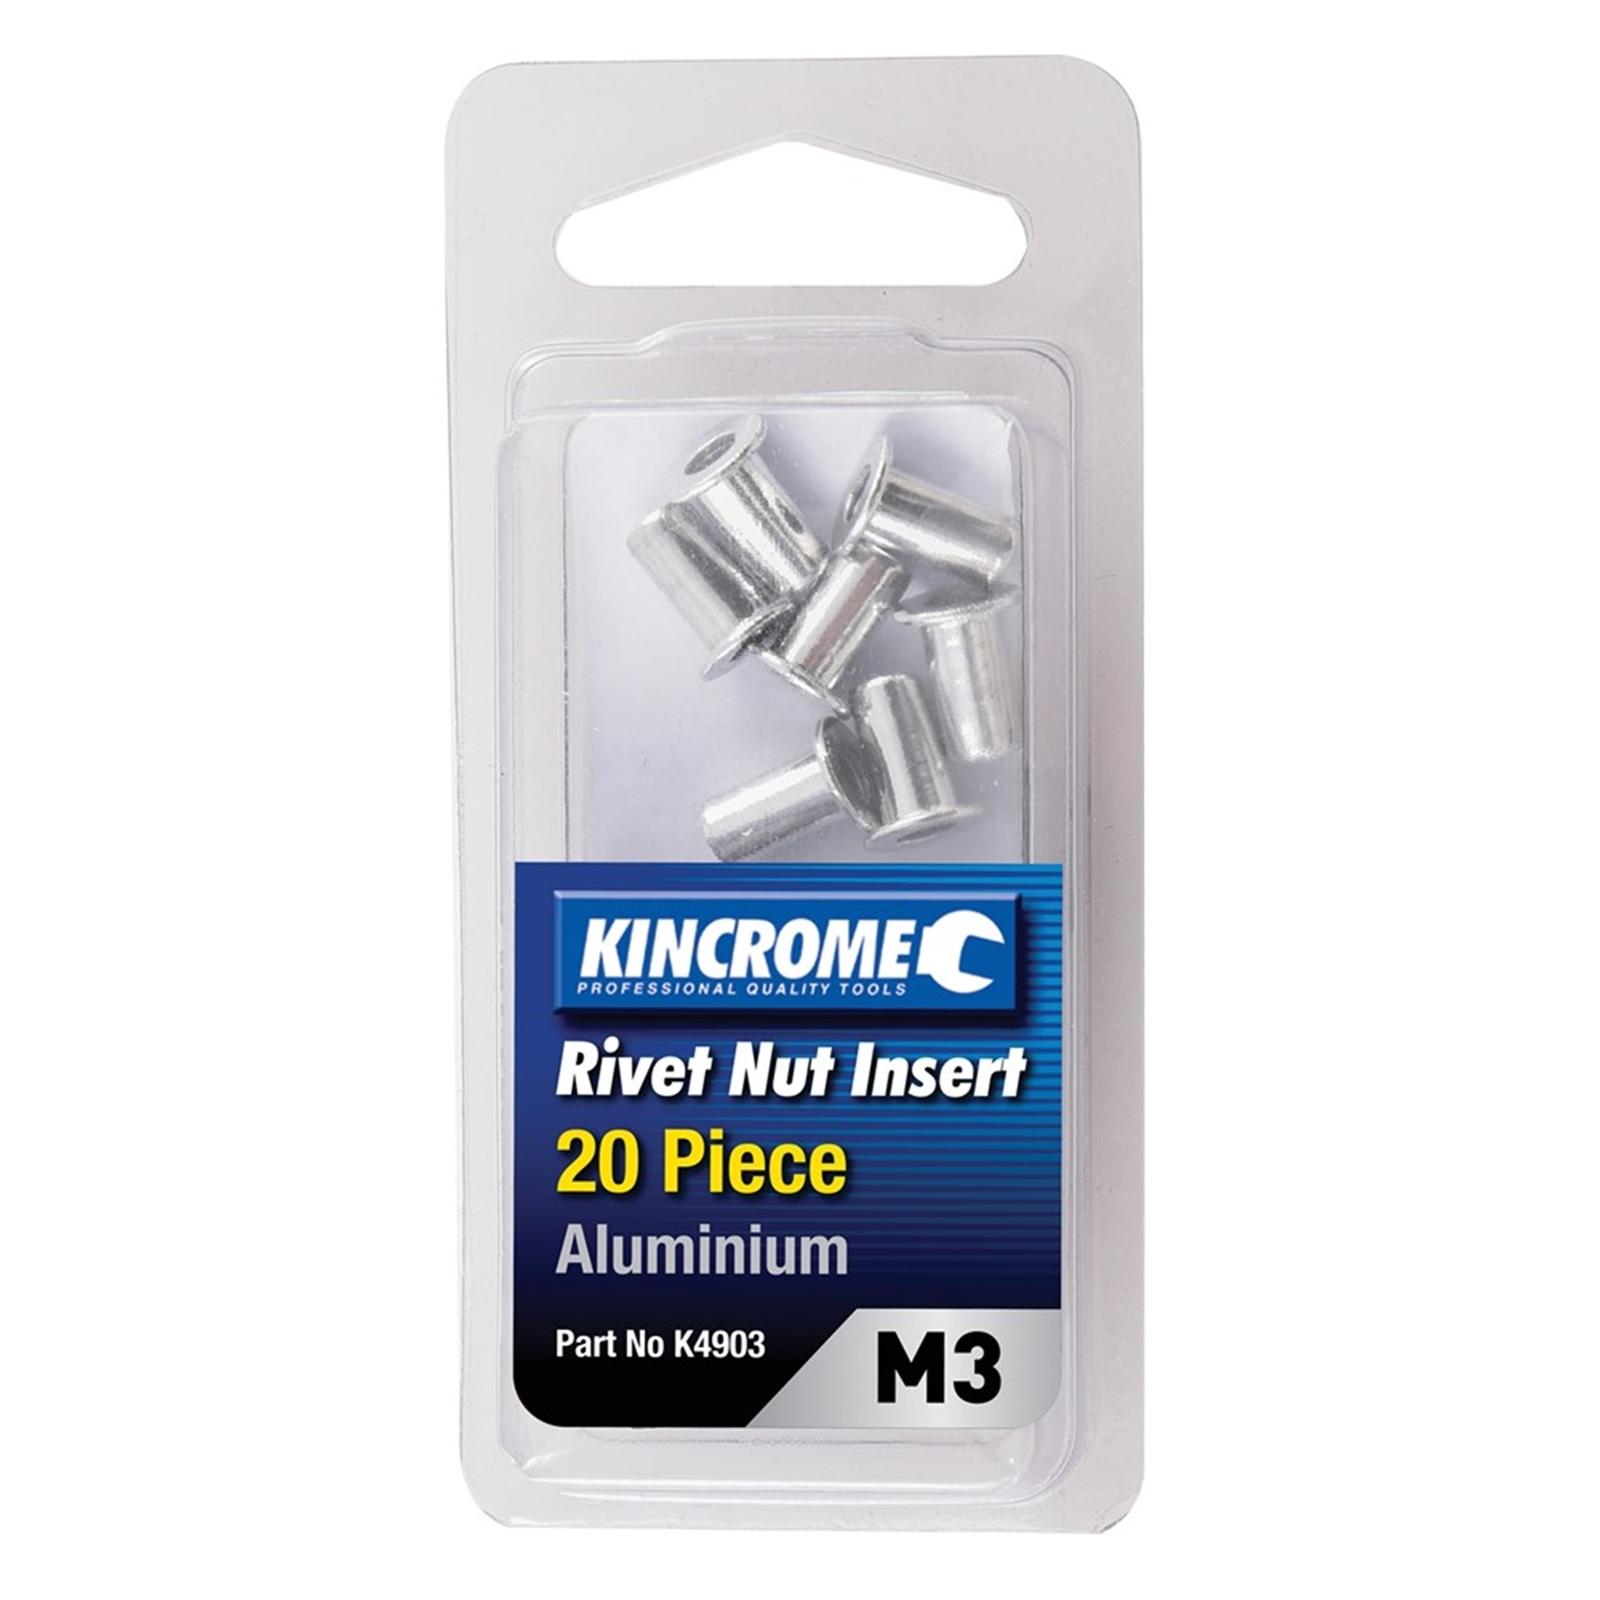 Kincrome M3 Aluminum Rivet Nut Insert - 20 Pack